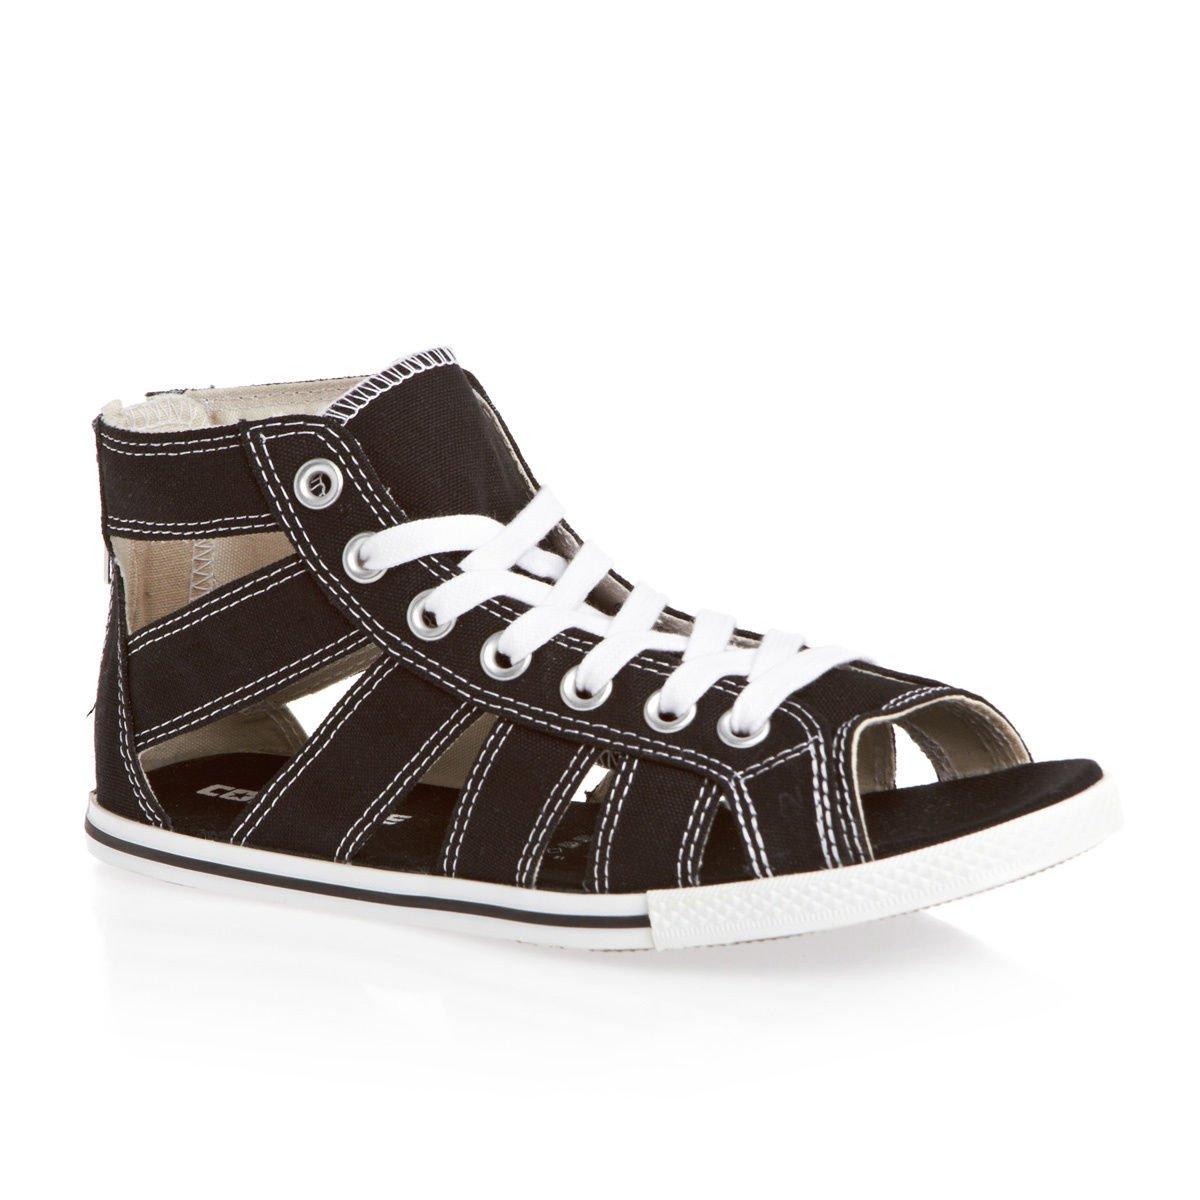 Converse Gladiator Mid Sandals, Black, 3 UK Adult: Amazon